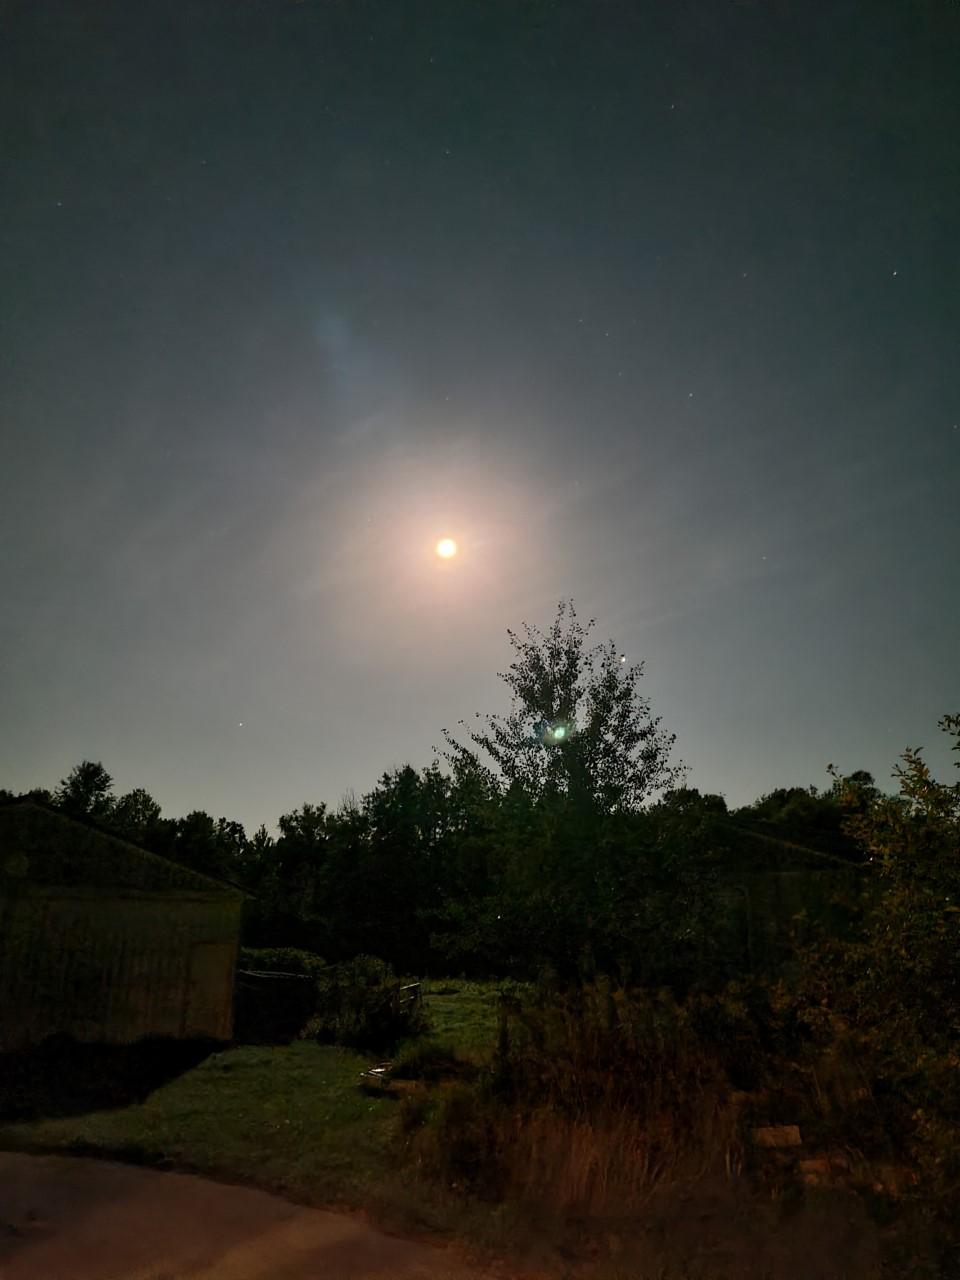 3am on 091921 full moon